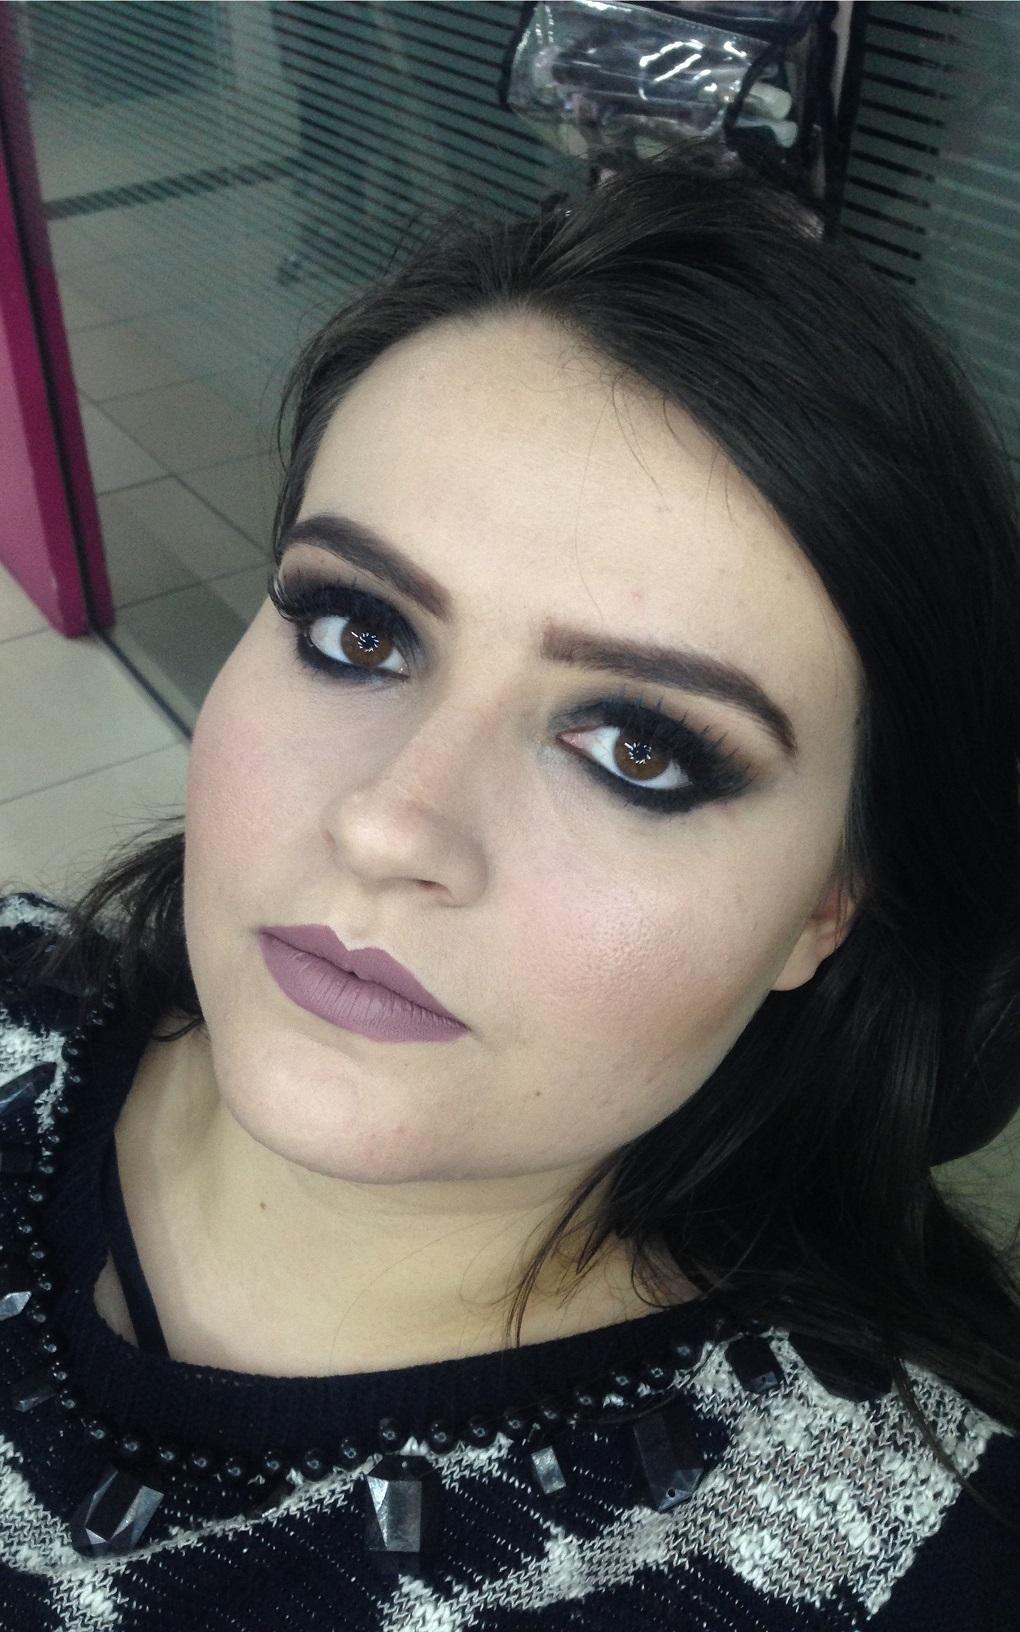 Smokey eye preto - Instagram @geisamedeirosmakeup #MakeUp #InstaMake #Maquiagem #MaquiagemDeFesta #MaquiagemProfissional #MaquiagemSocial #GeisaMedeirosMakeUp #PPF #PausaParaFeminices #Vult #VultCosmética #Bitarra #MaryKay #RubyRose #Luisance #Dailus #QuemDisseBerenice #Contém1g #Morphe #PincéisMacrilan #LuFerraes #Mac maquiagem maquiador(a) designer de sobrancelhas